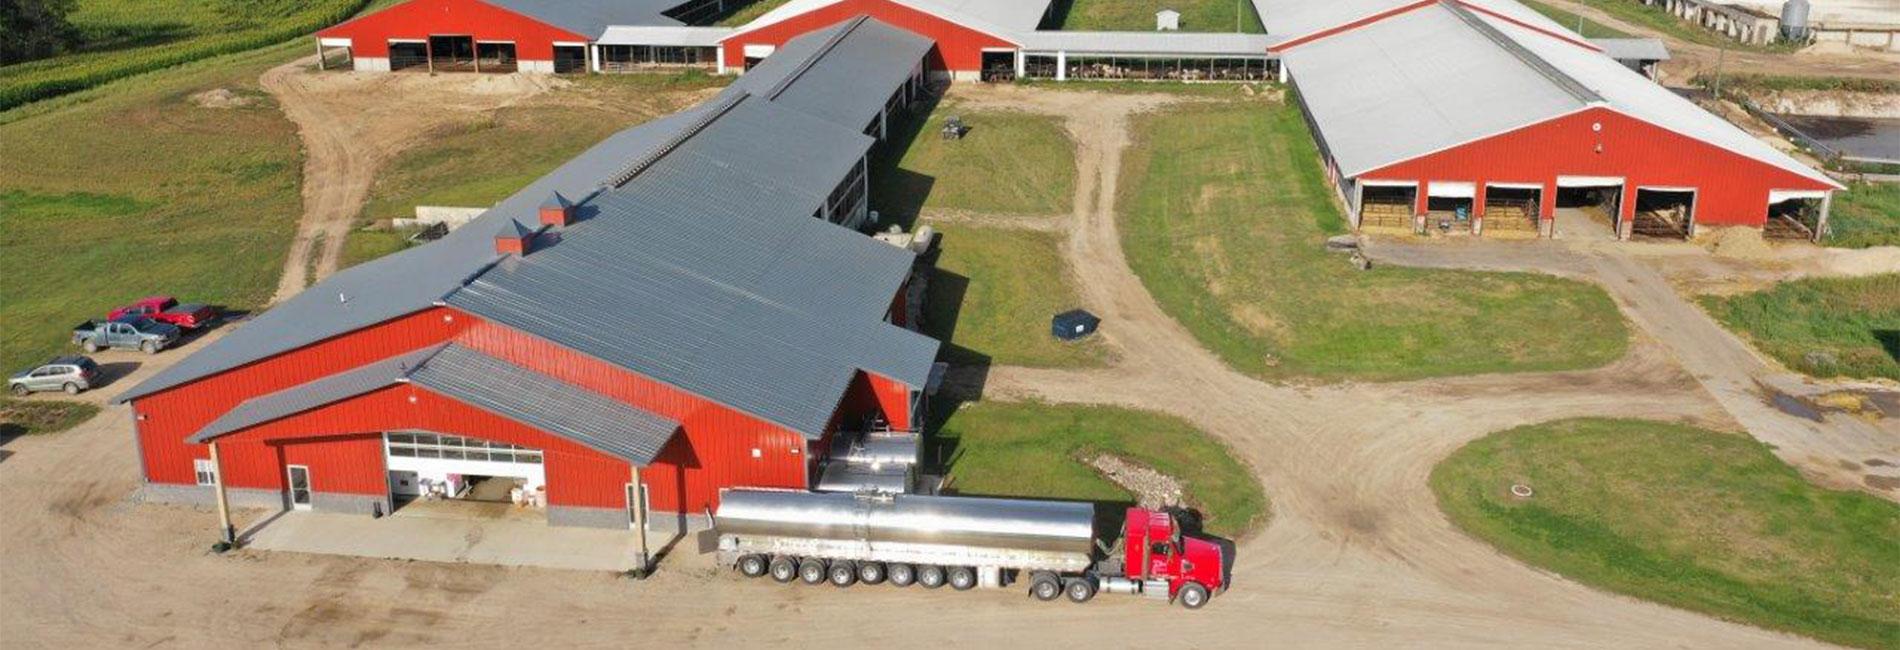 Dairy Farm & Agriculture Building Construction